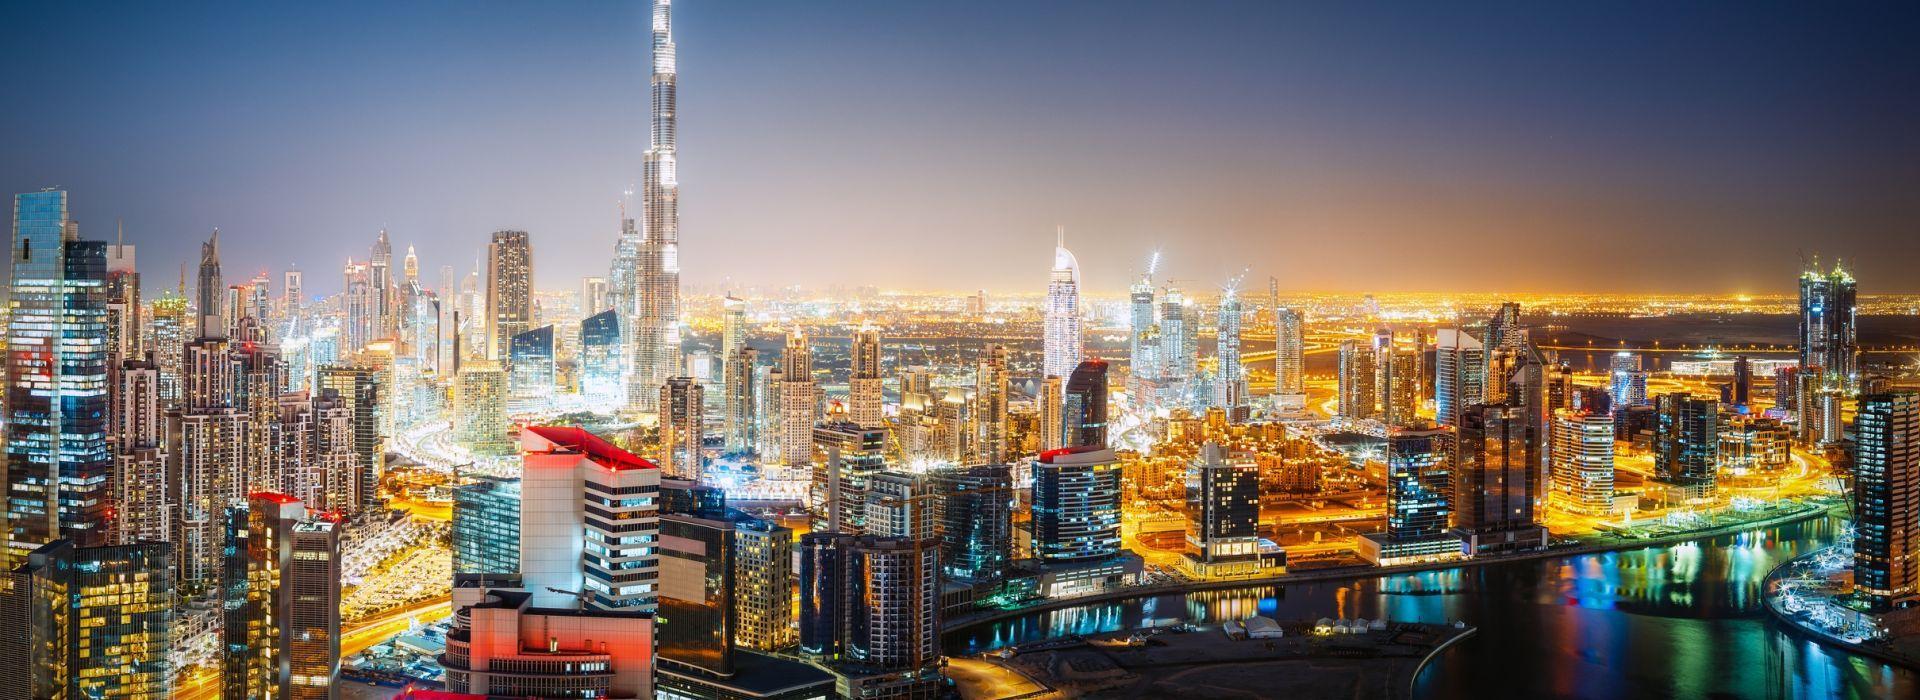 City sightseeing Tours in Dubai